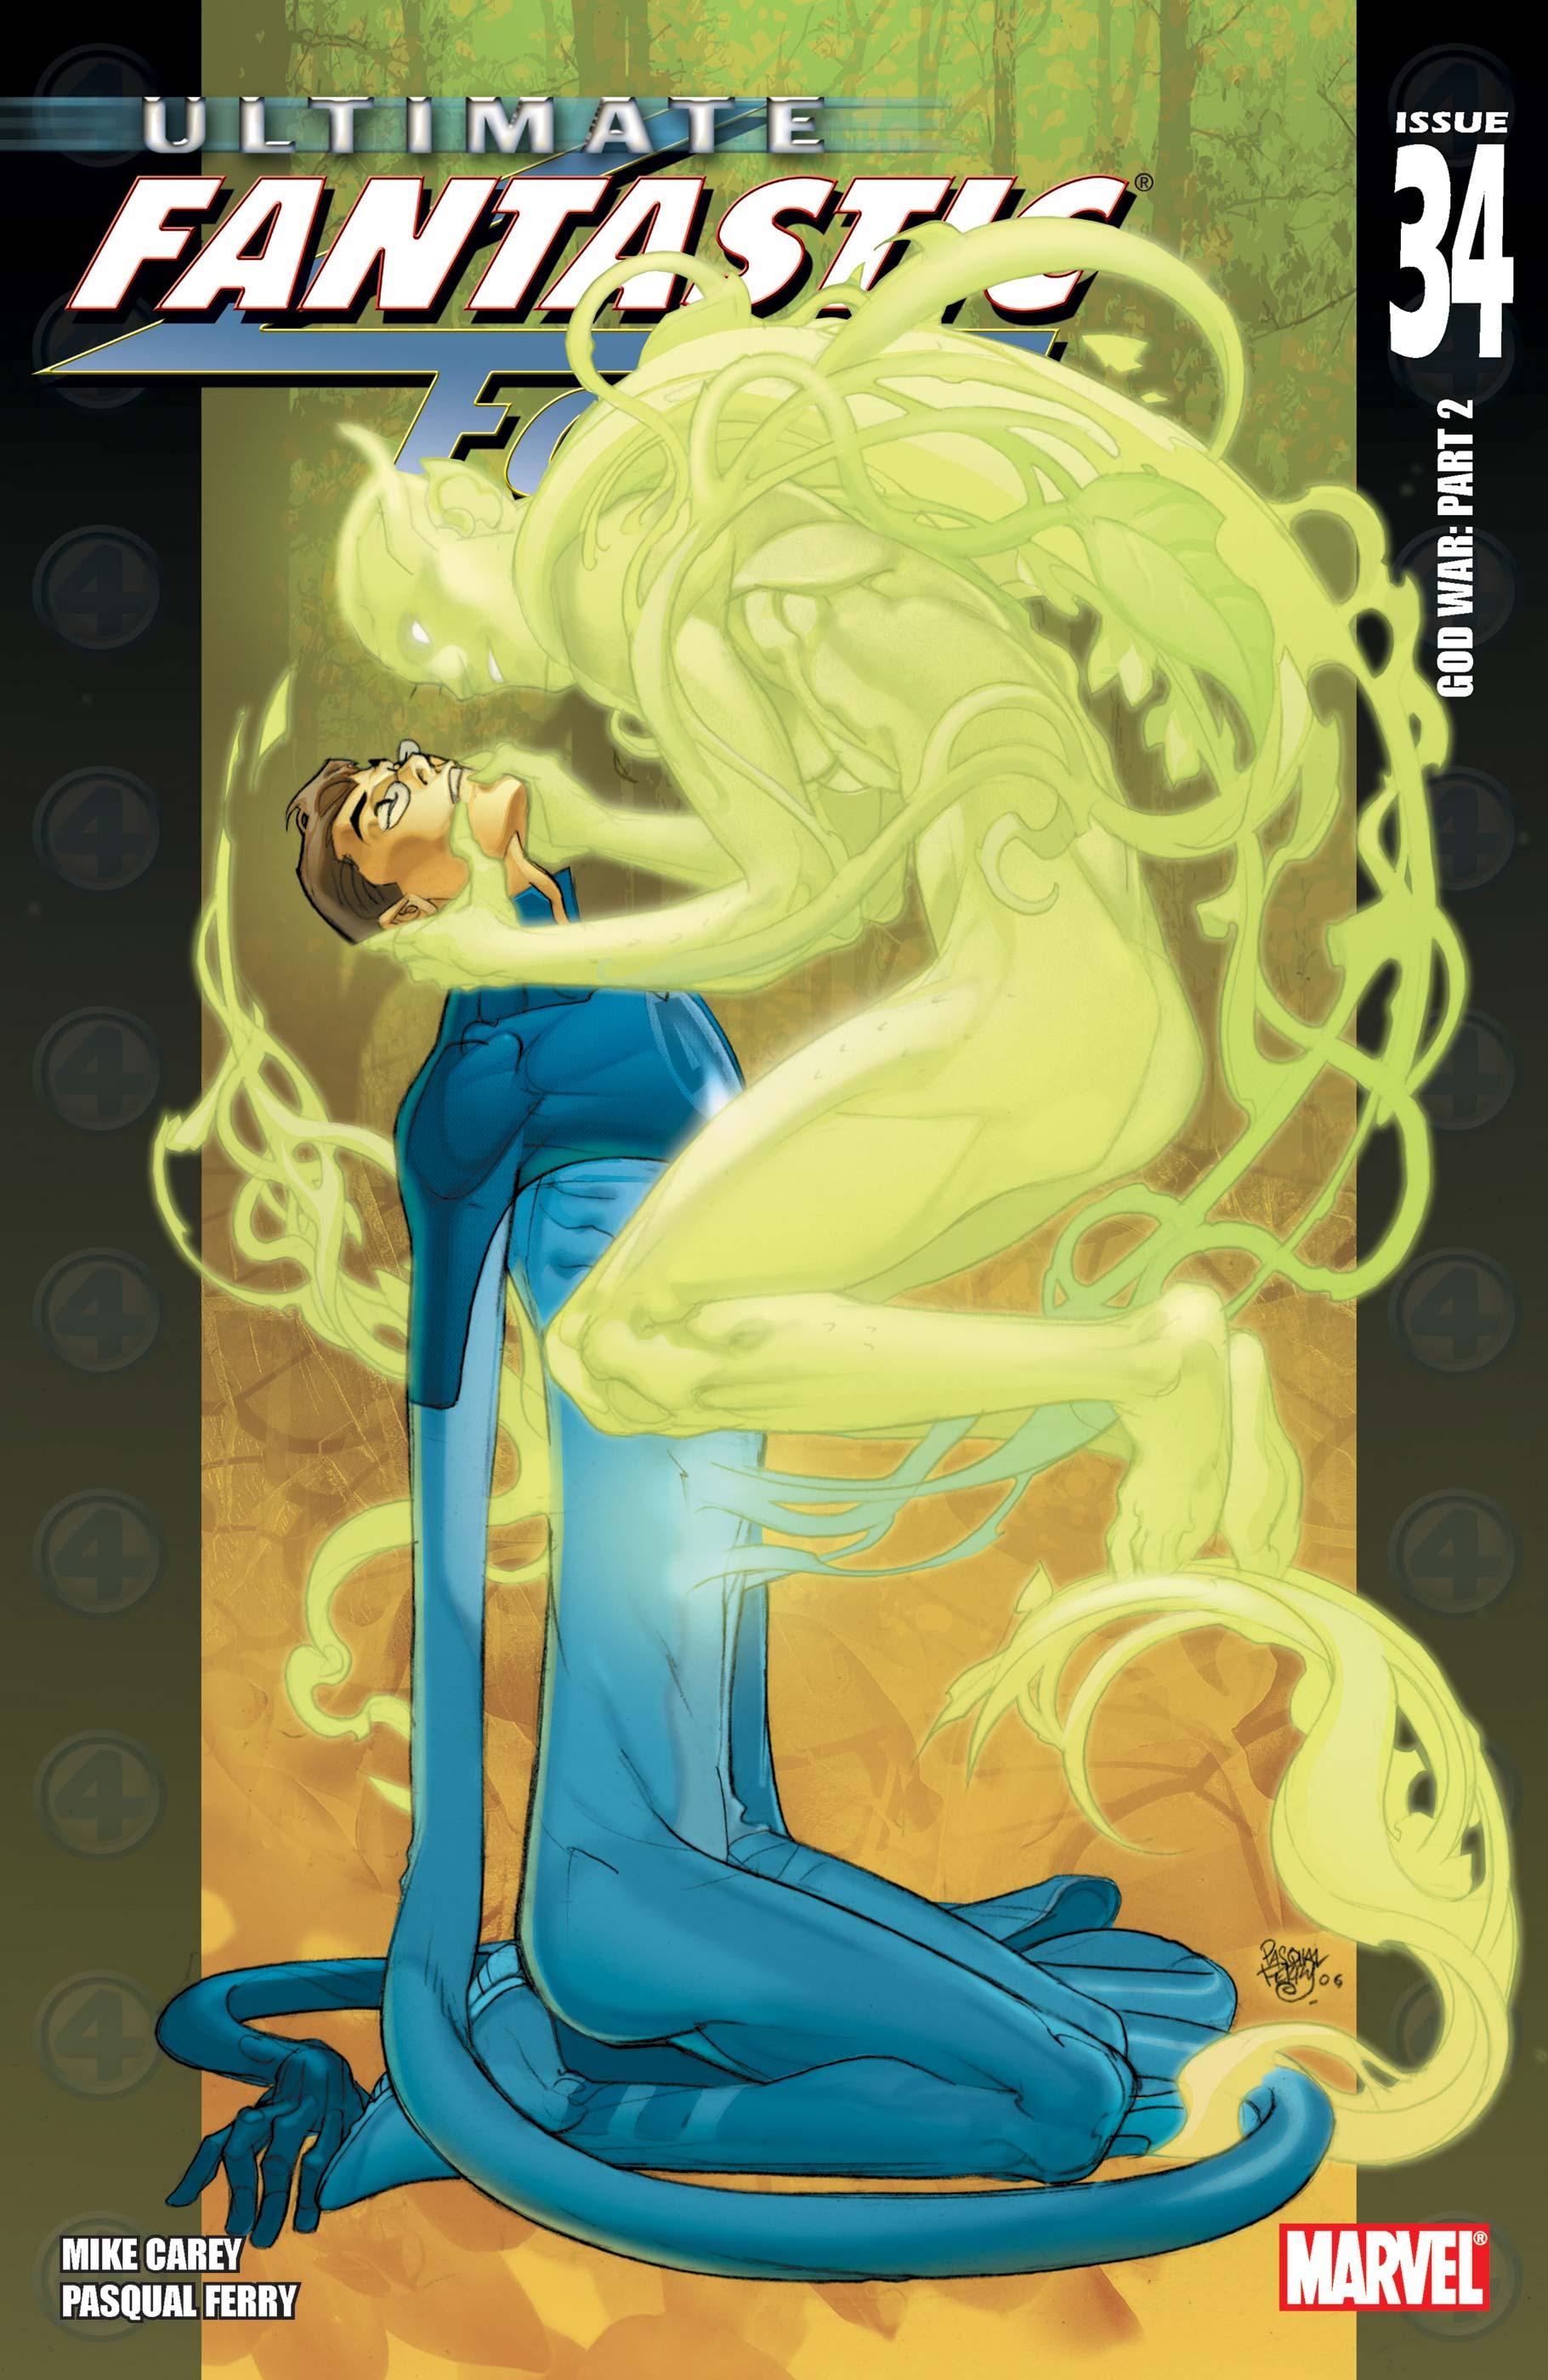 Ultimate Fantastic Four (2003) #34